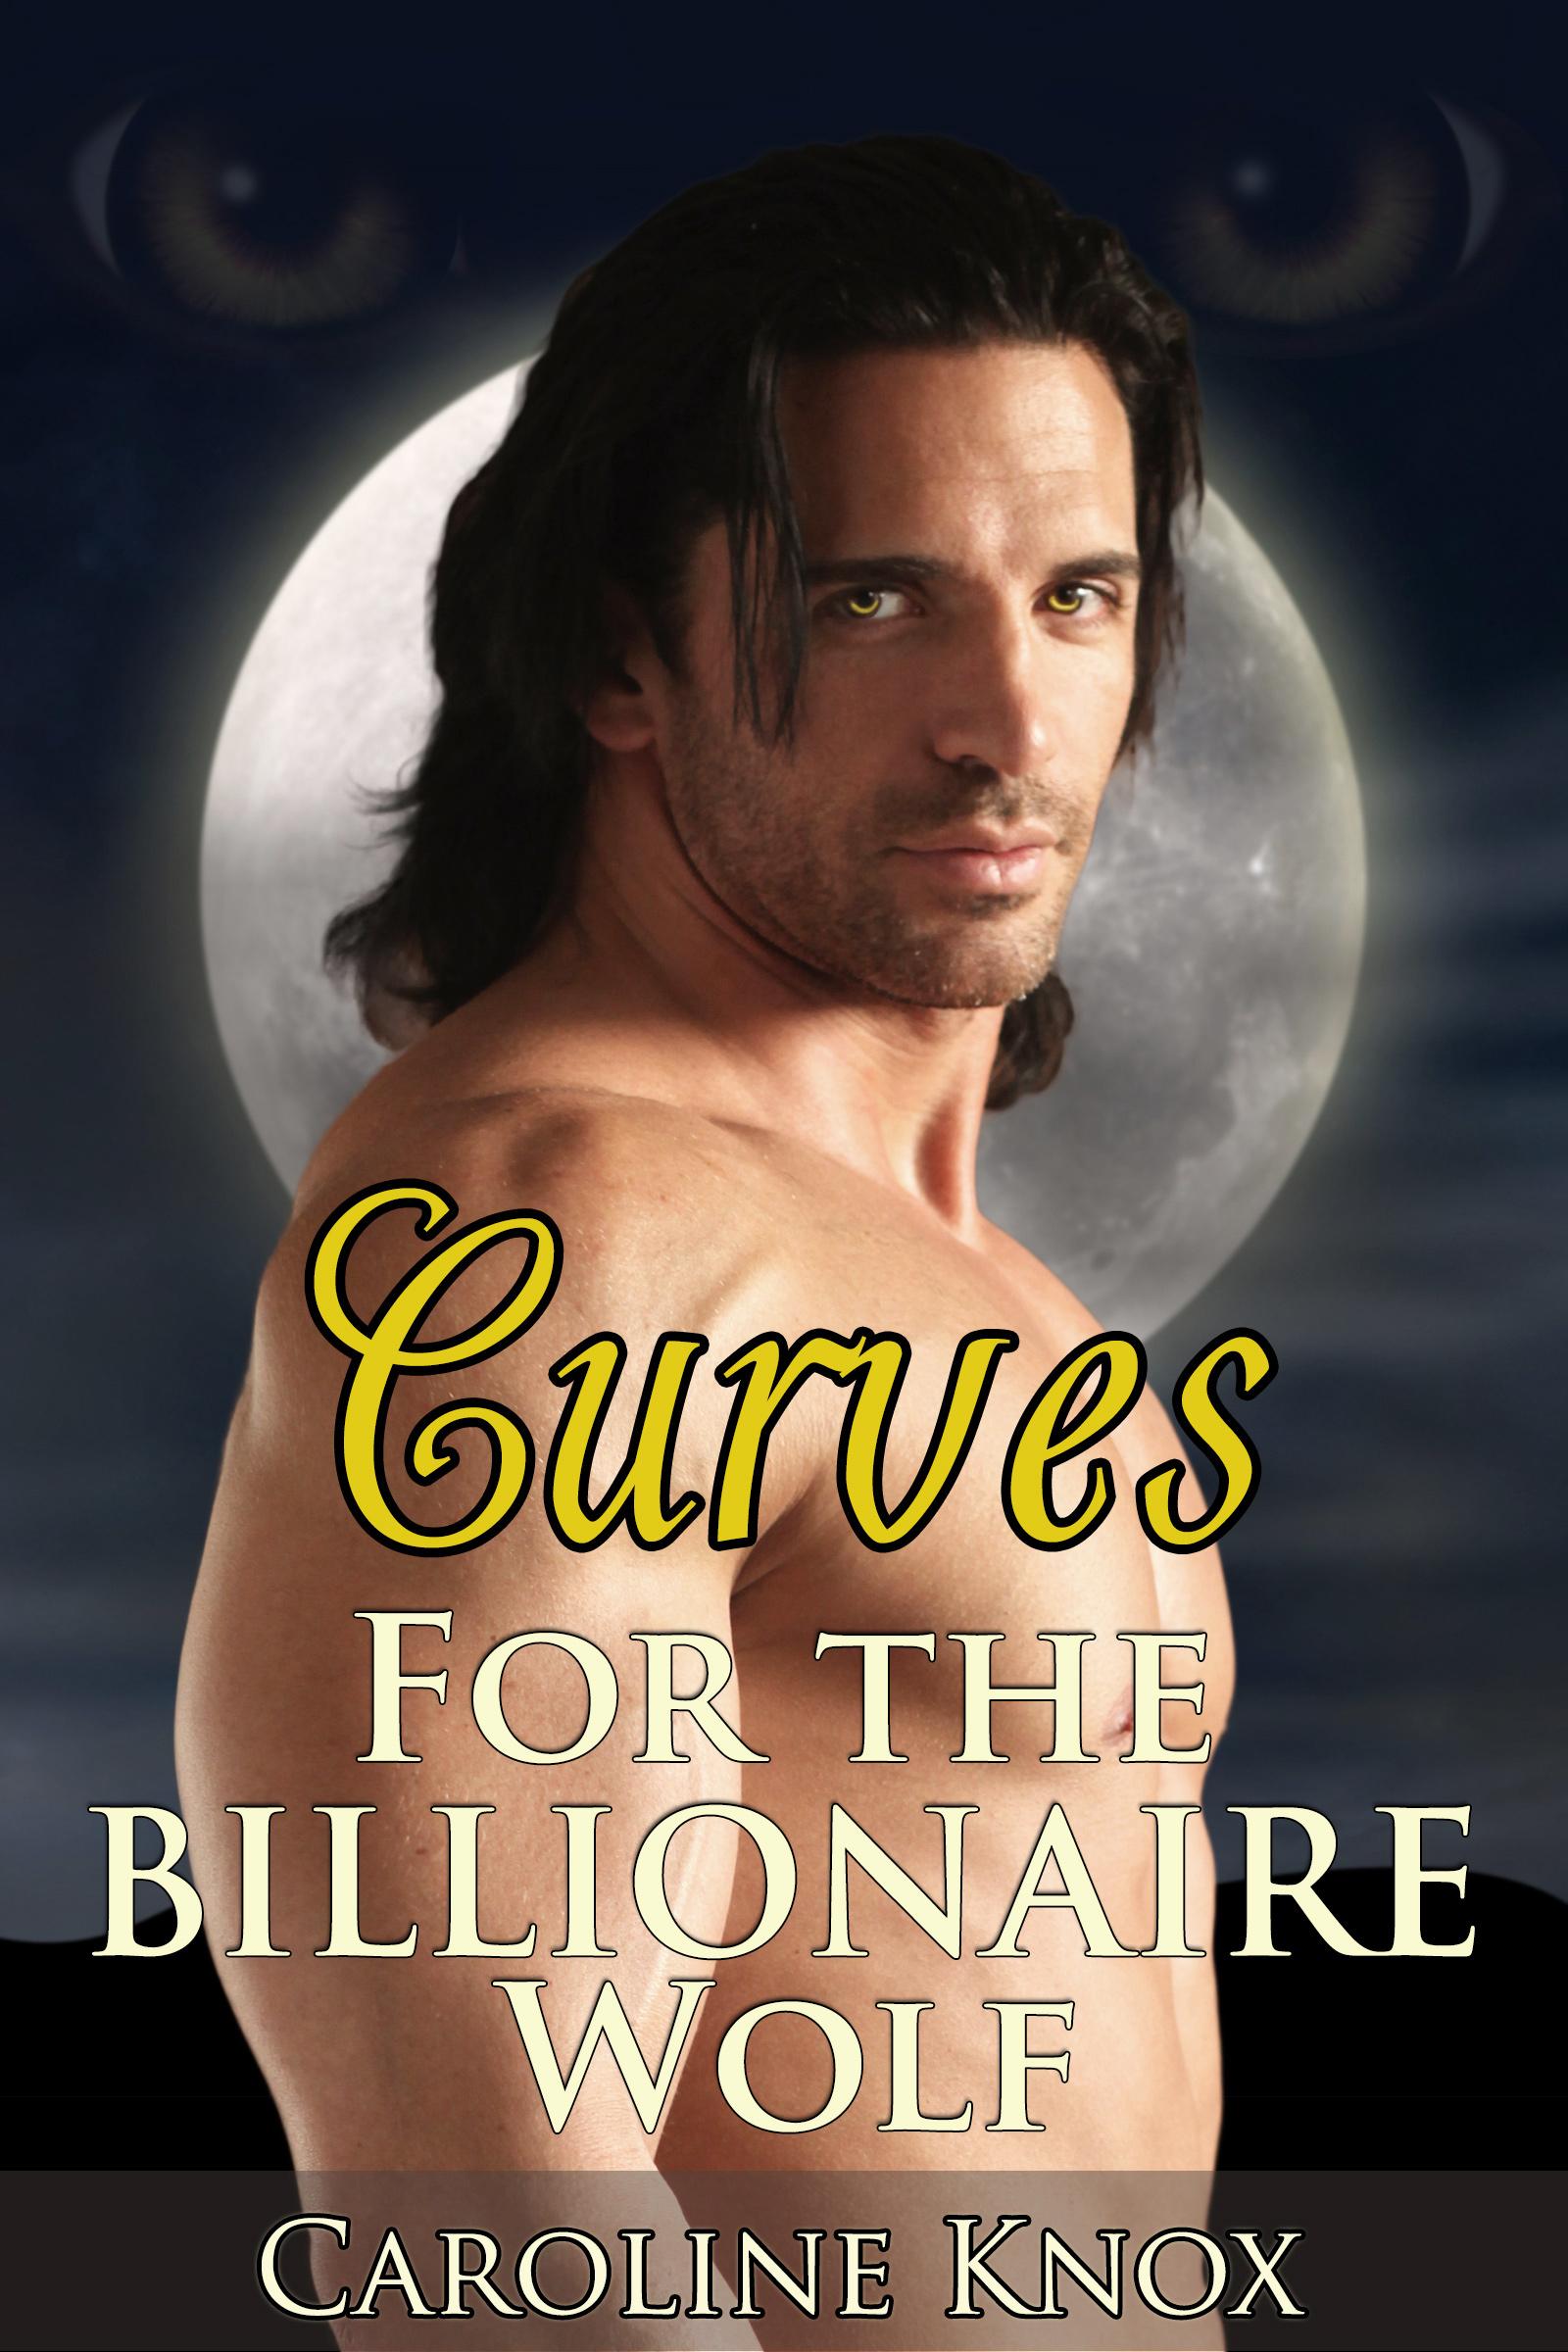 Caroline Knox - Curves for the Billionaire Wolf (BBW Paranormal Erotic Romance)